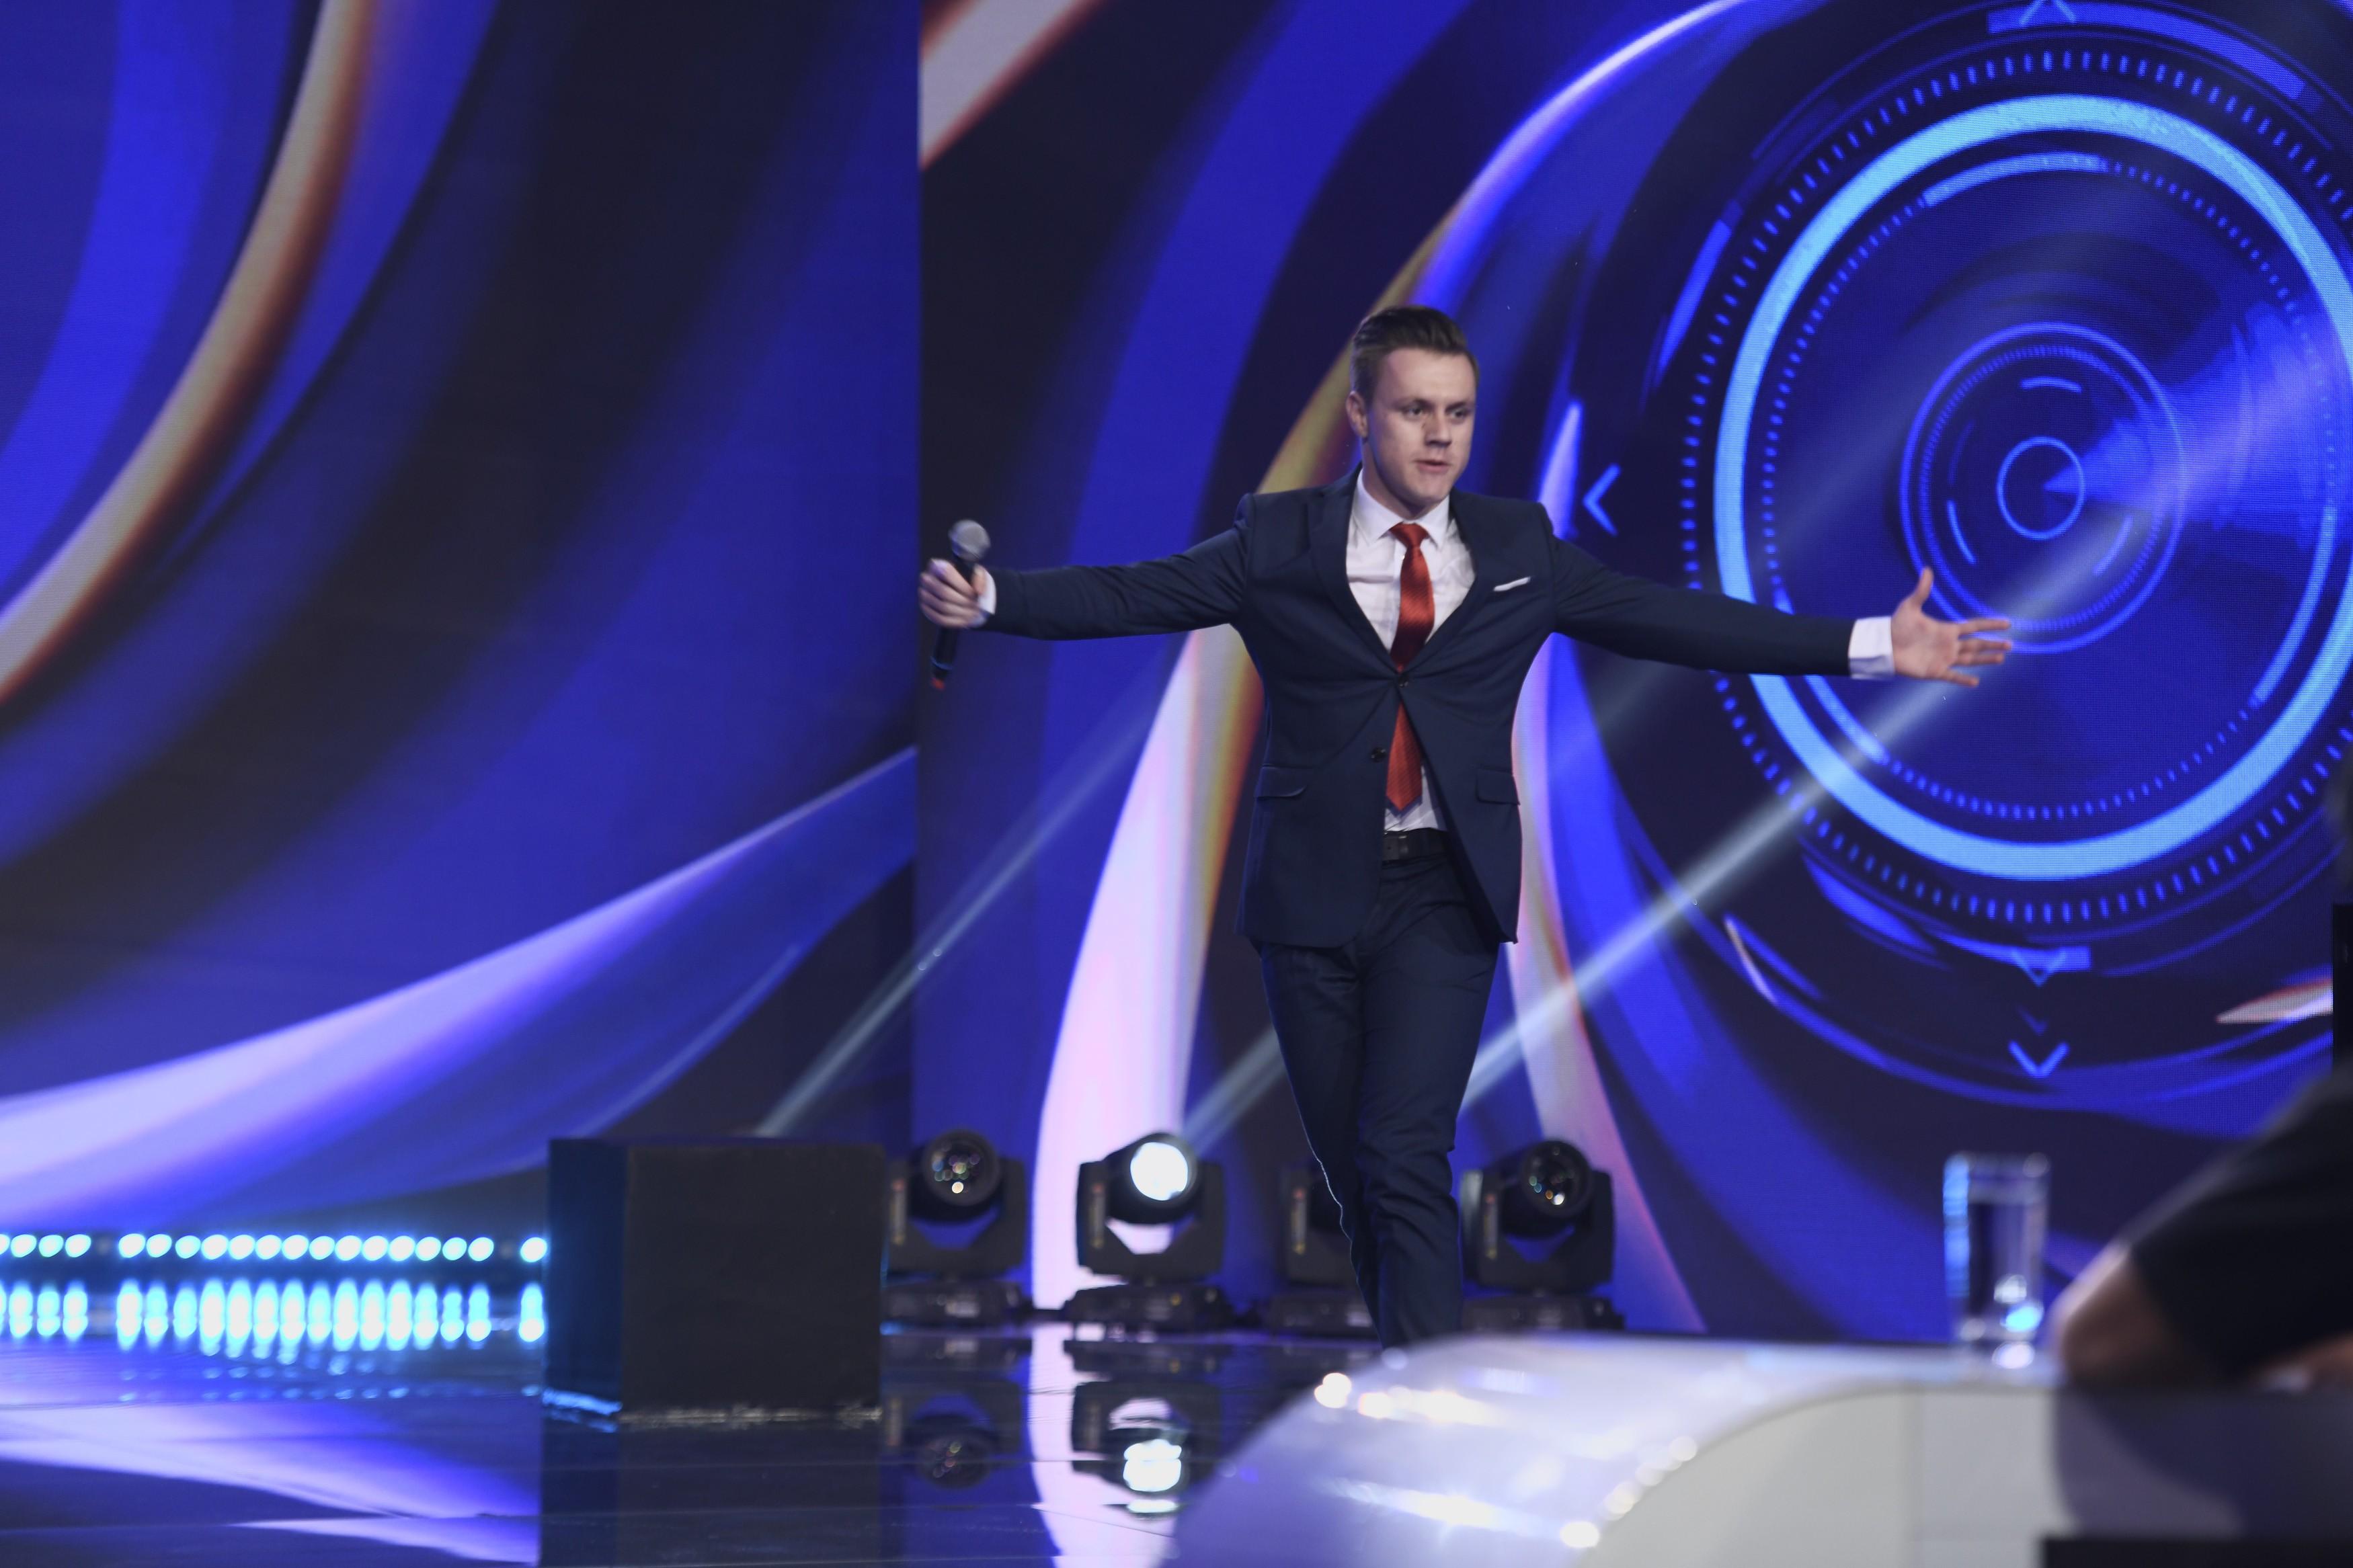 Semifinala iUmor 2020: Mihai Lucacs, un nou număr de stand up comedy